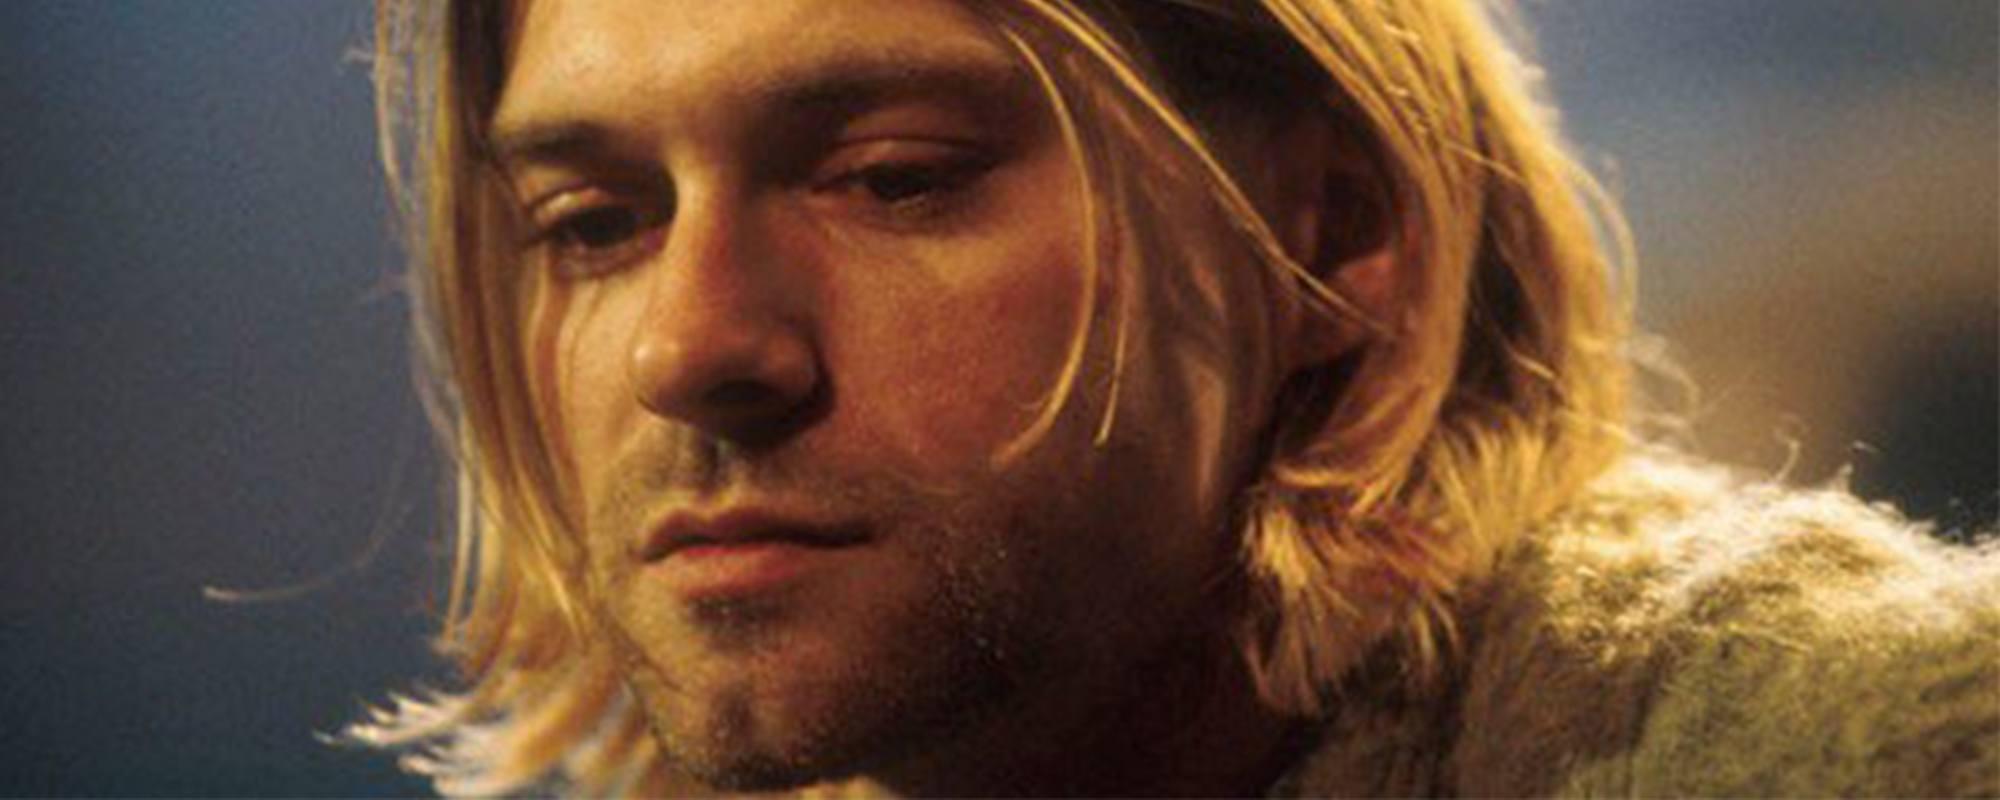 Kurt Cobain's Suicide